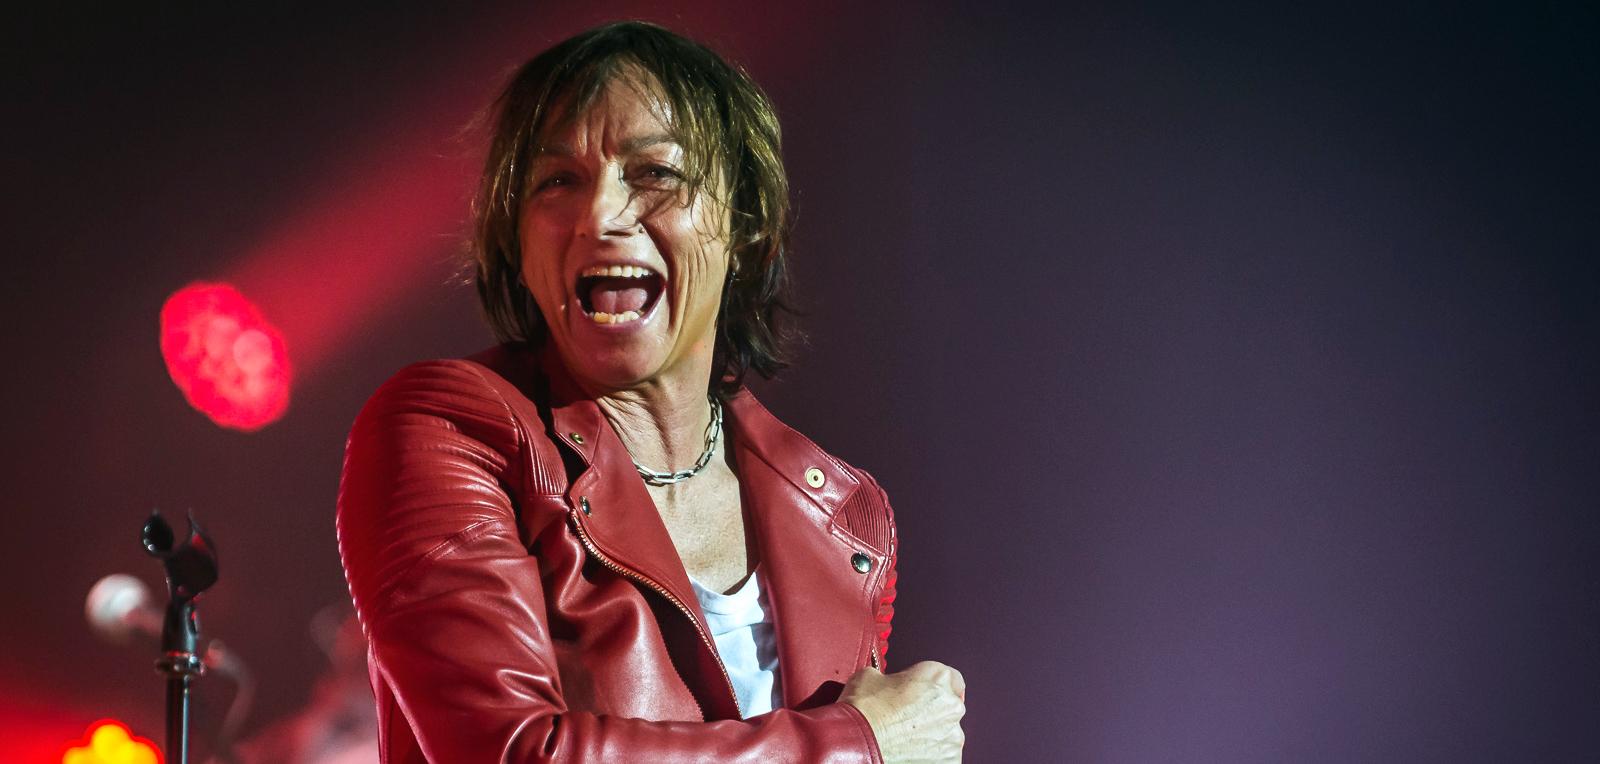 Gianna Nannini: America dal 1979 ritorna in radio per i 40 anni i carriera